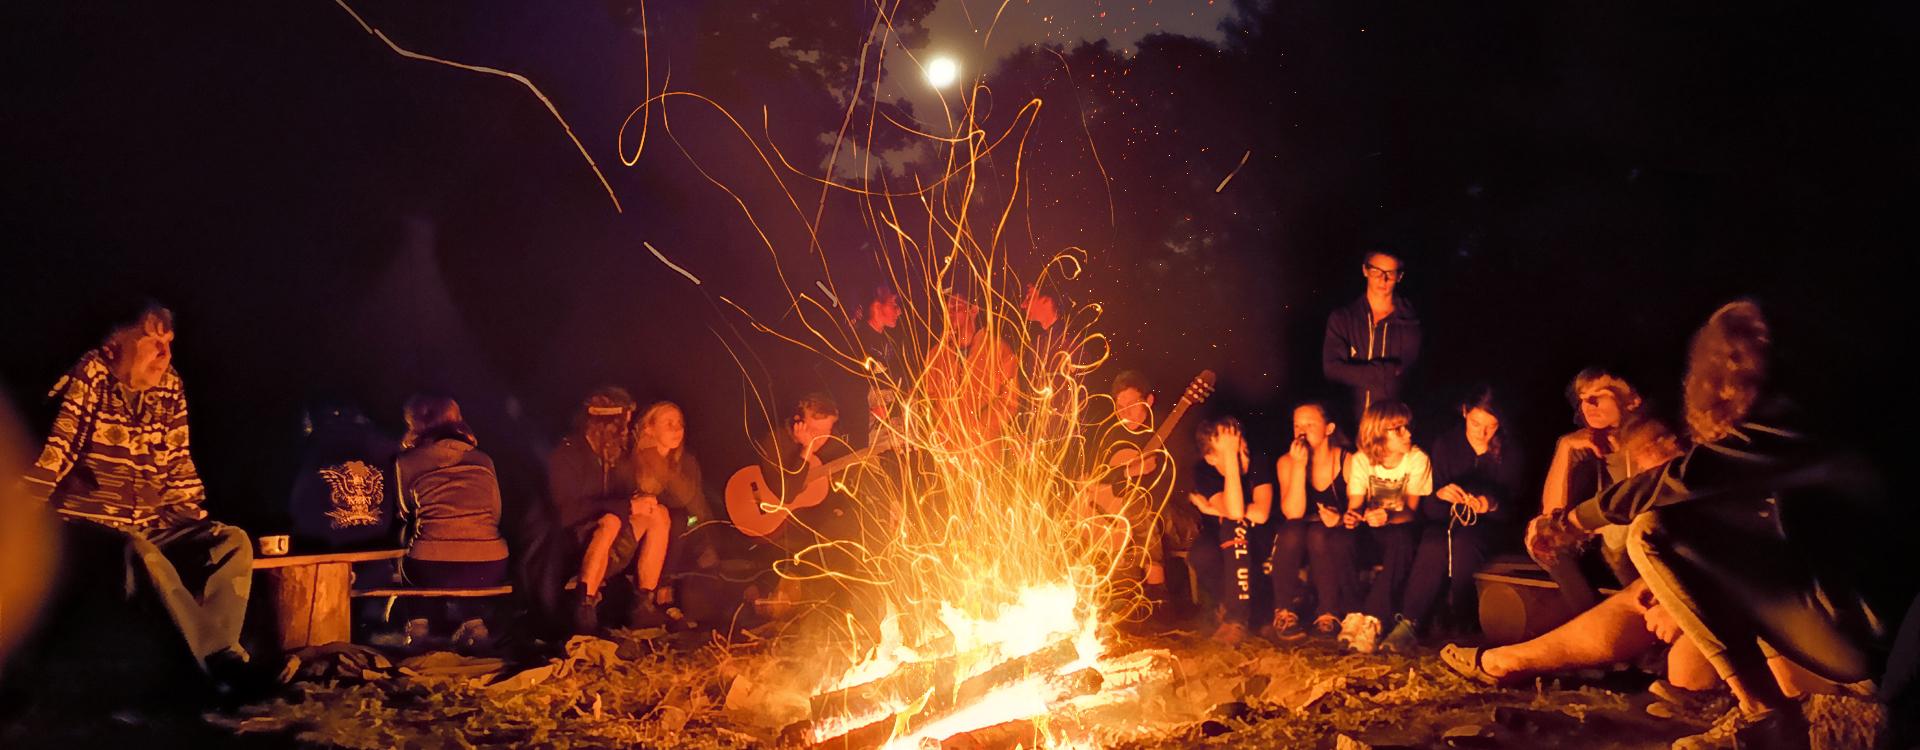 U táborového ohně